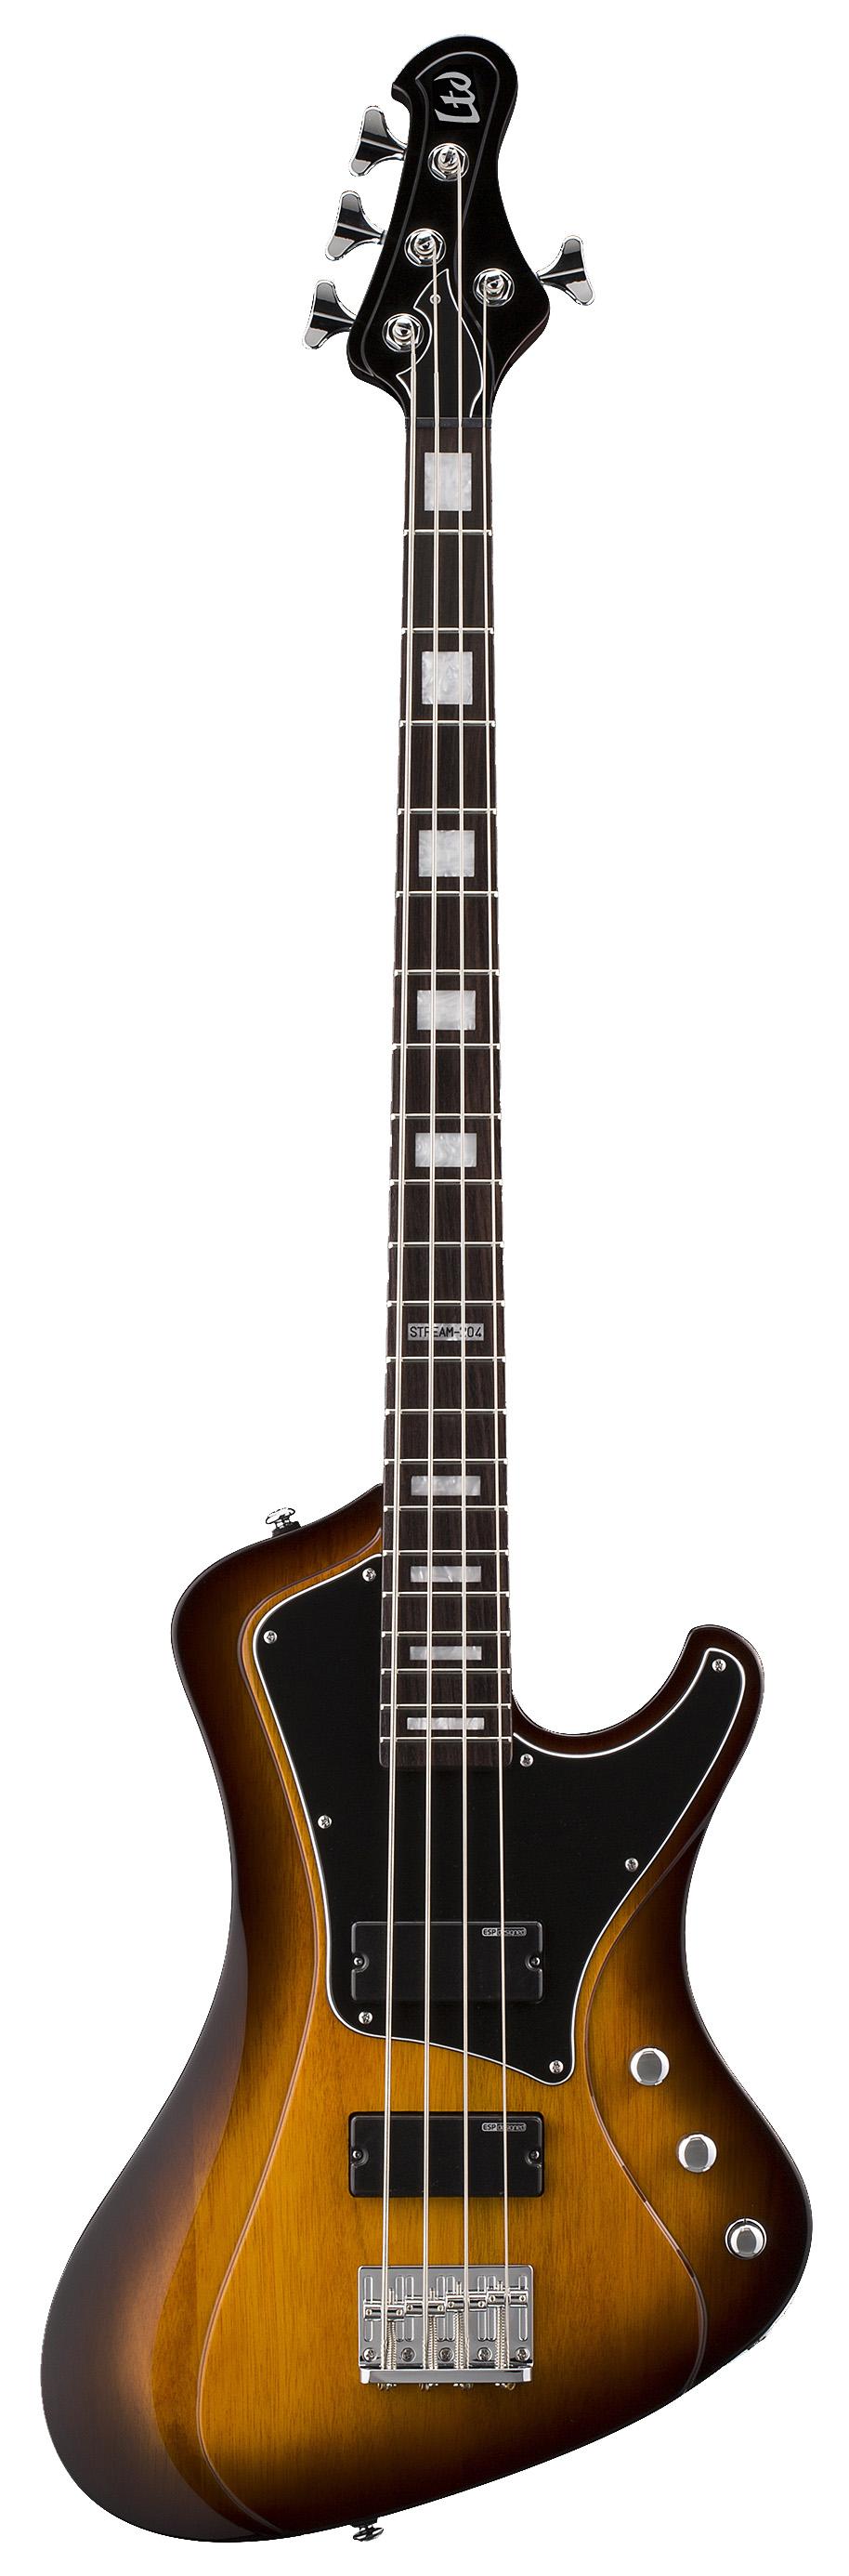 ESP LTD STREAM-204 TSB Stream Series Mahogany Body Electric Bass Guitar w/ Tobacco Sunburst Finish